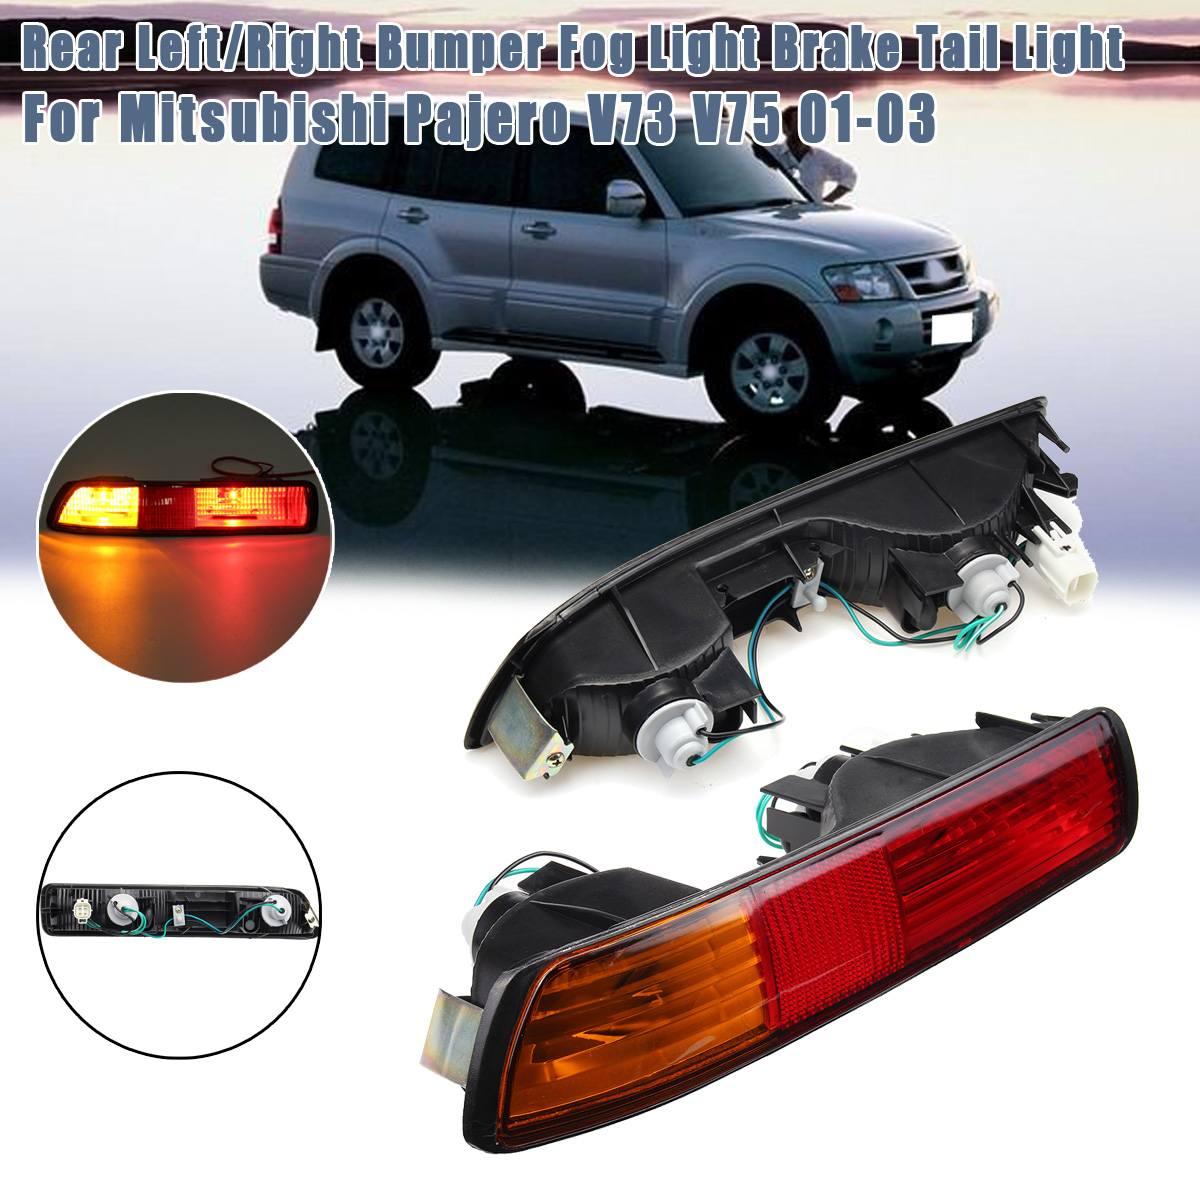 Rear Light Unit Mitsubishi Pajero 2003-2006 Left Side MN133765